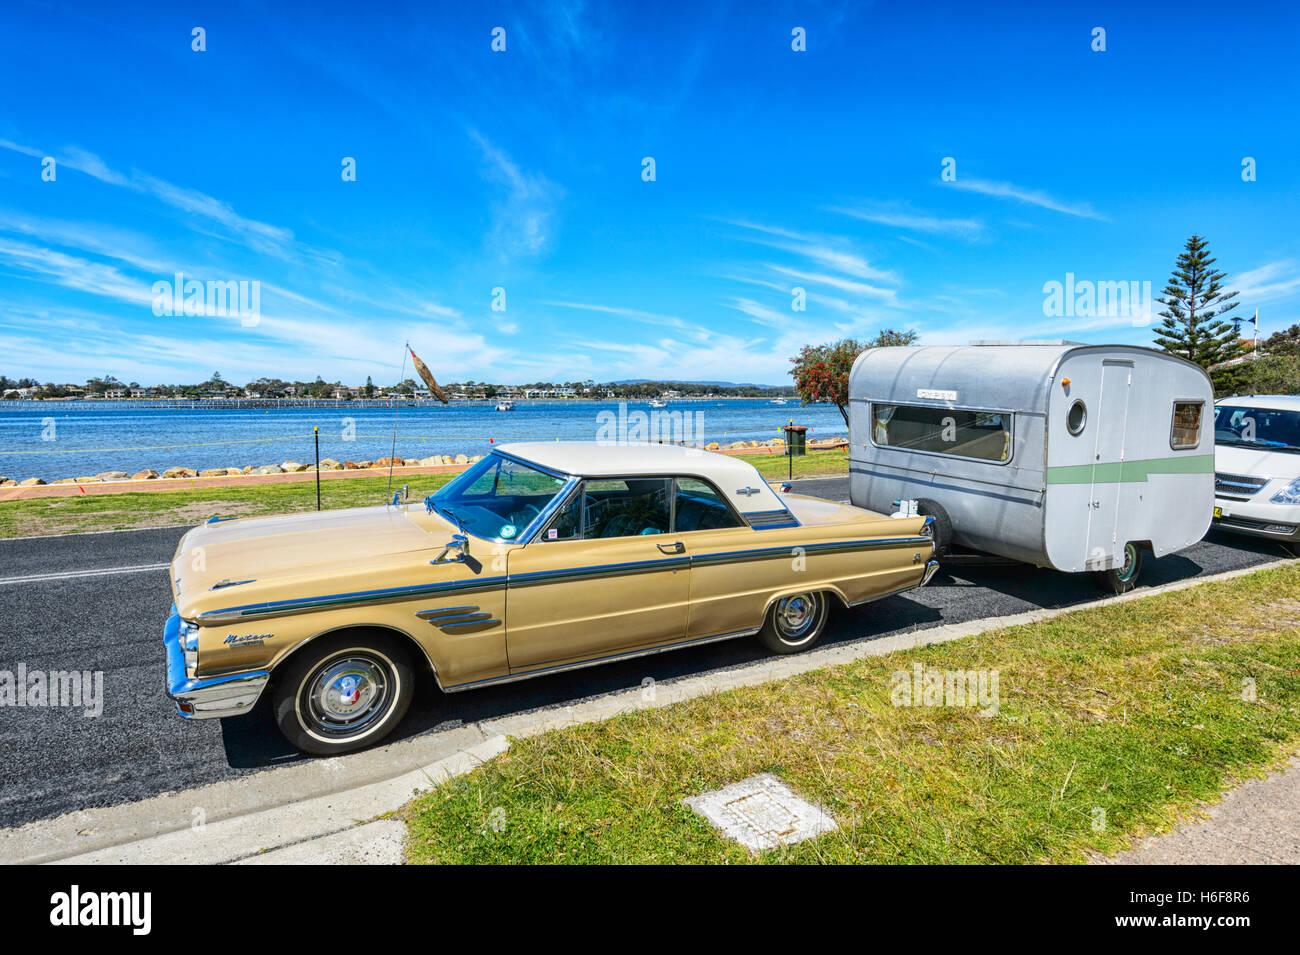 Vintage Mercury Meteor car towing an old style caravan nicknamed 'Gypsy', Merimbula, New South Wales, Australia - Stock Image